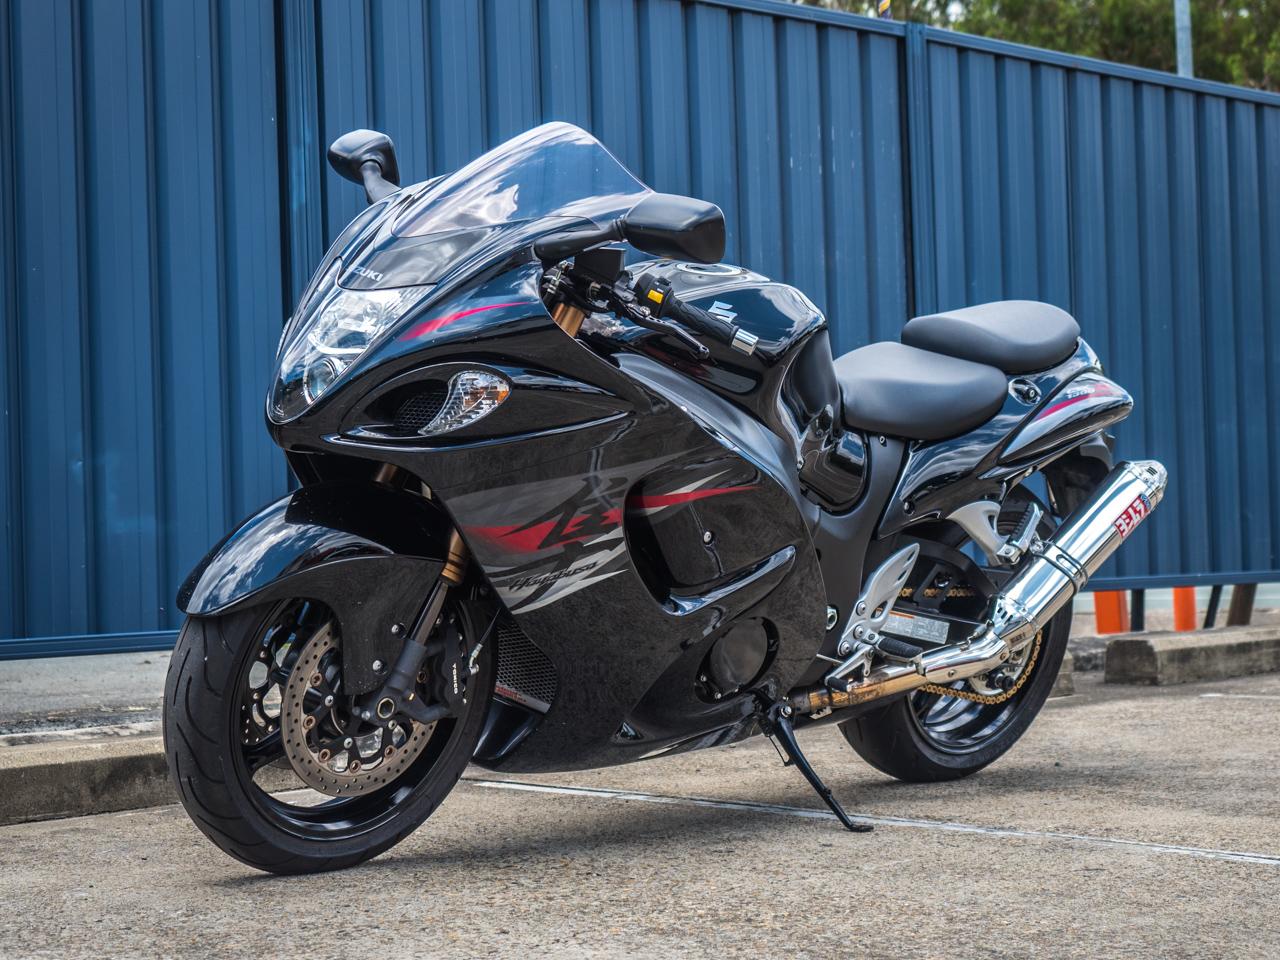 Suzuki Hayabusa 2012 Glass Black ⋆ Motorcycles R Us